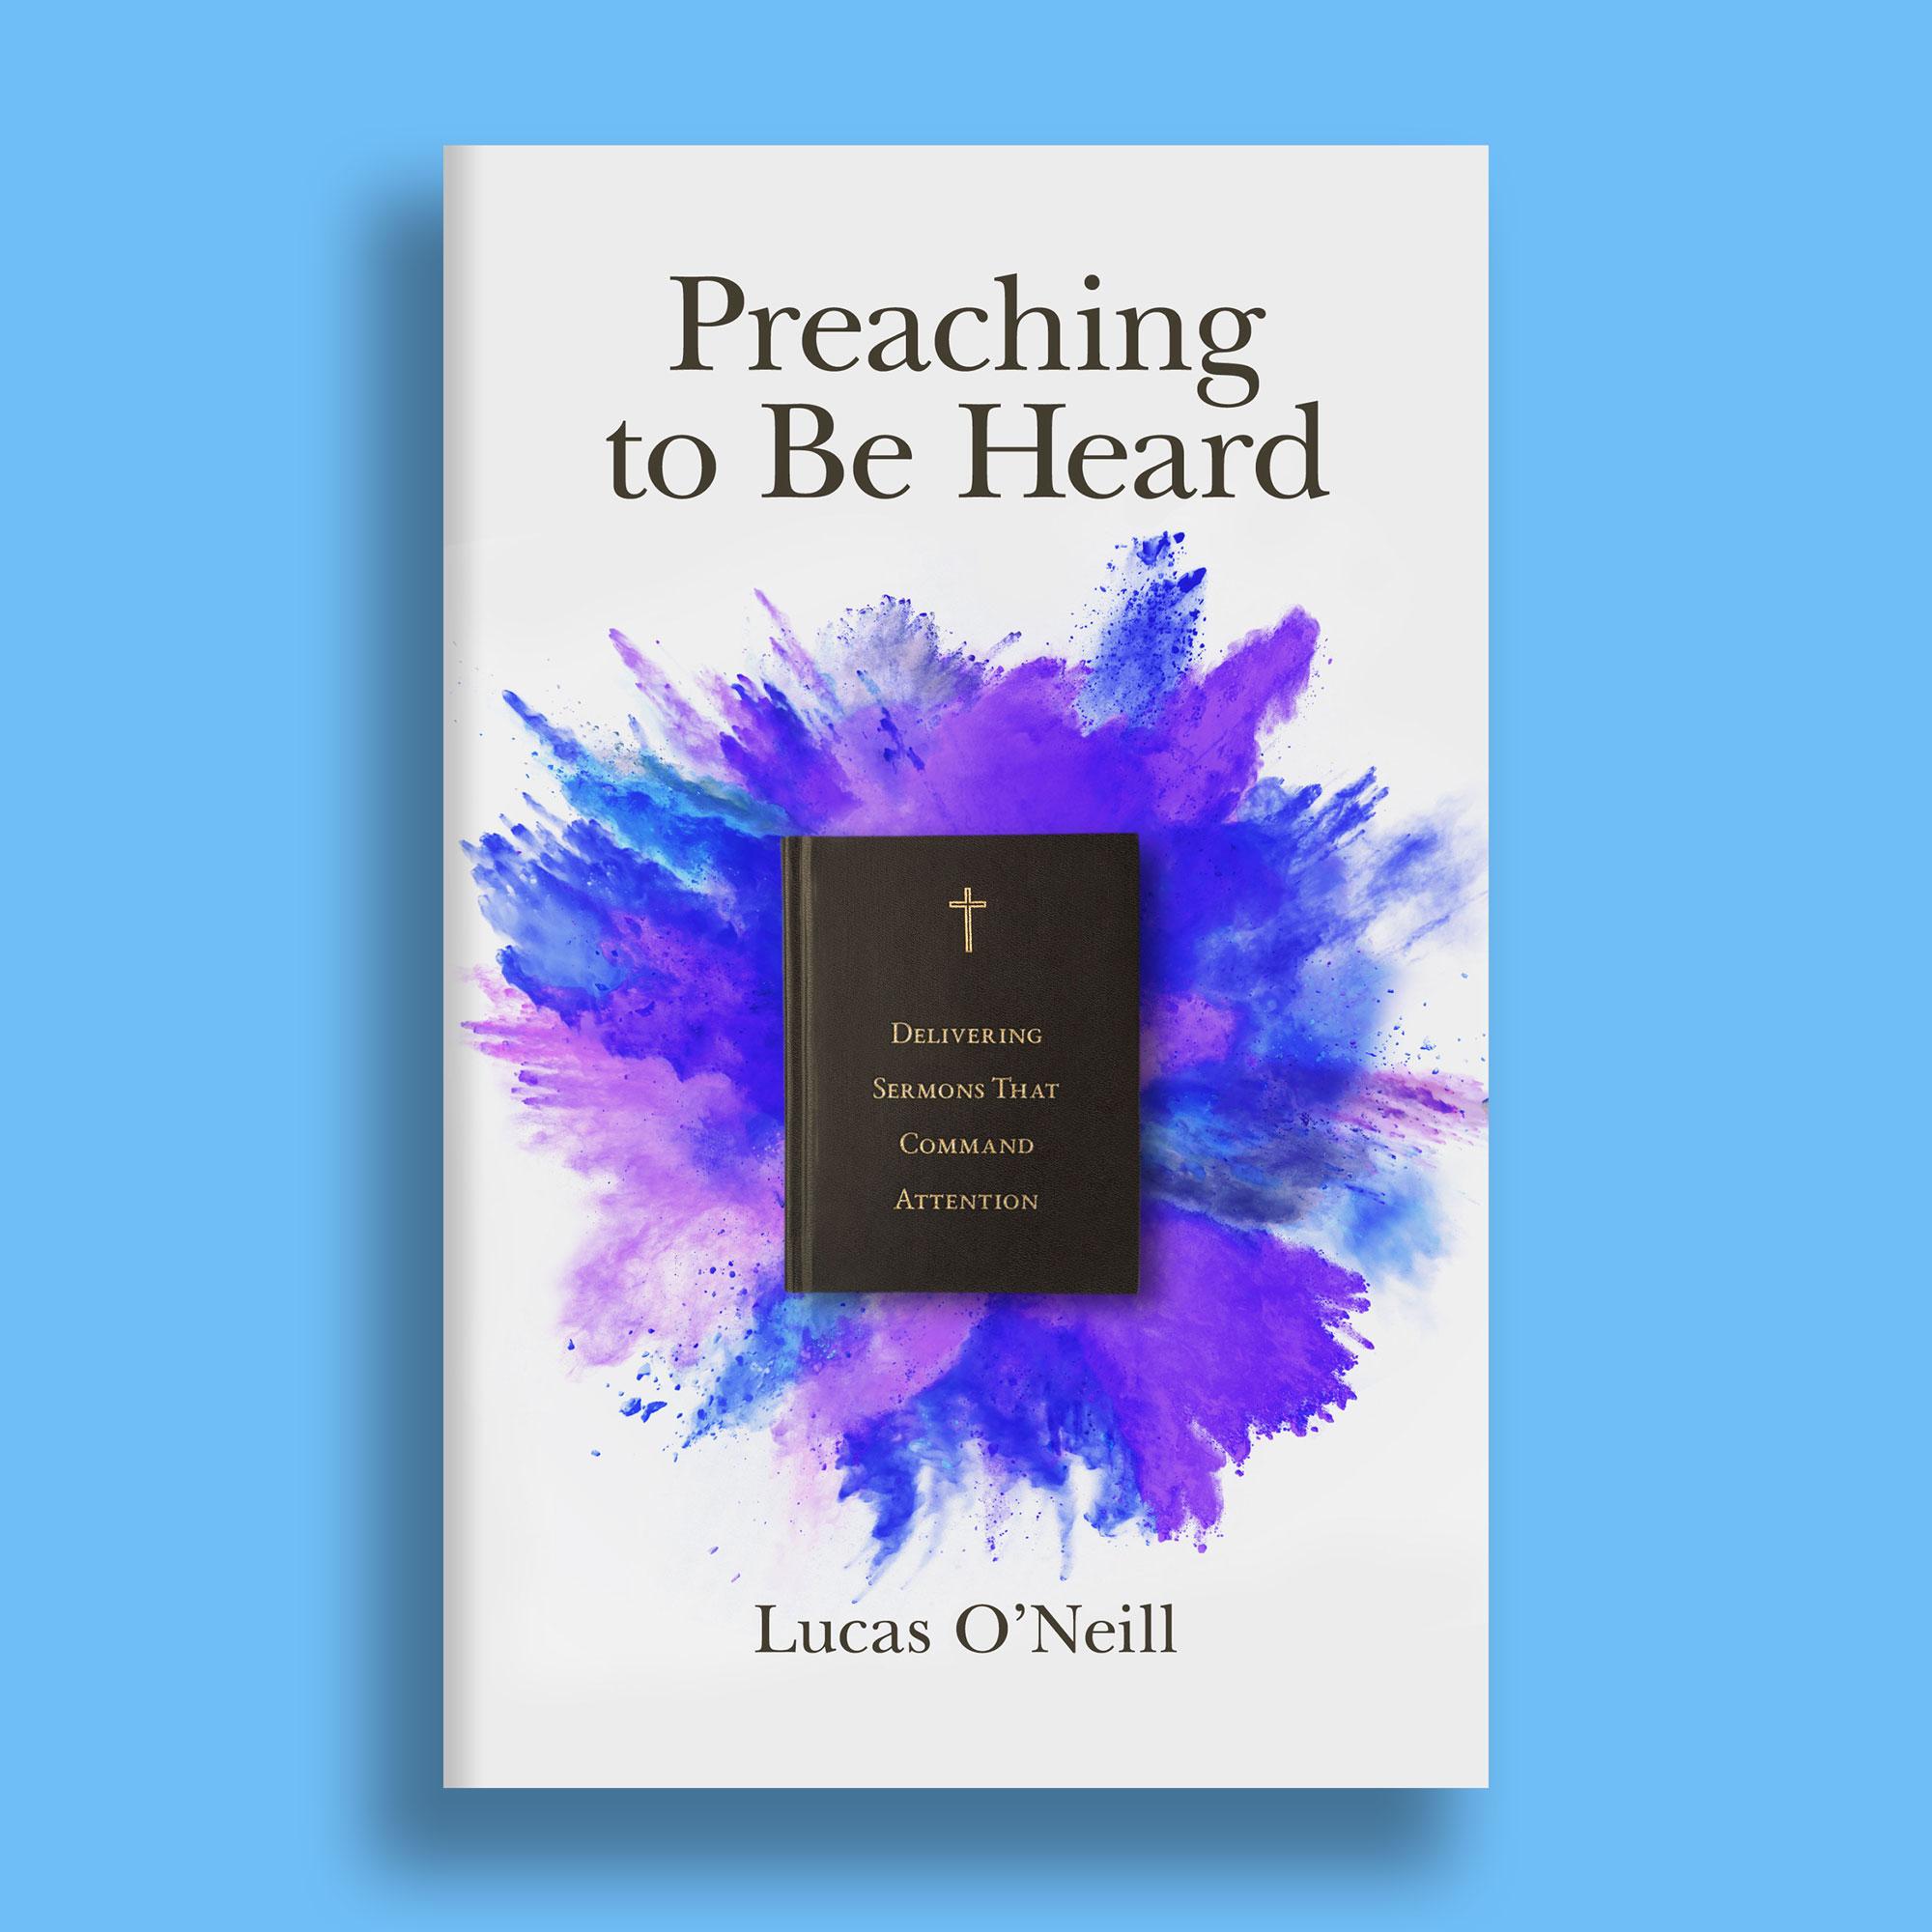 Preaching-to-Be-Heard_Jim_LePage.jpg